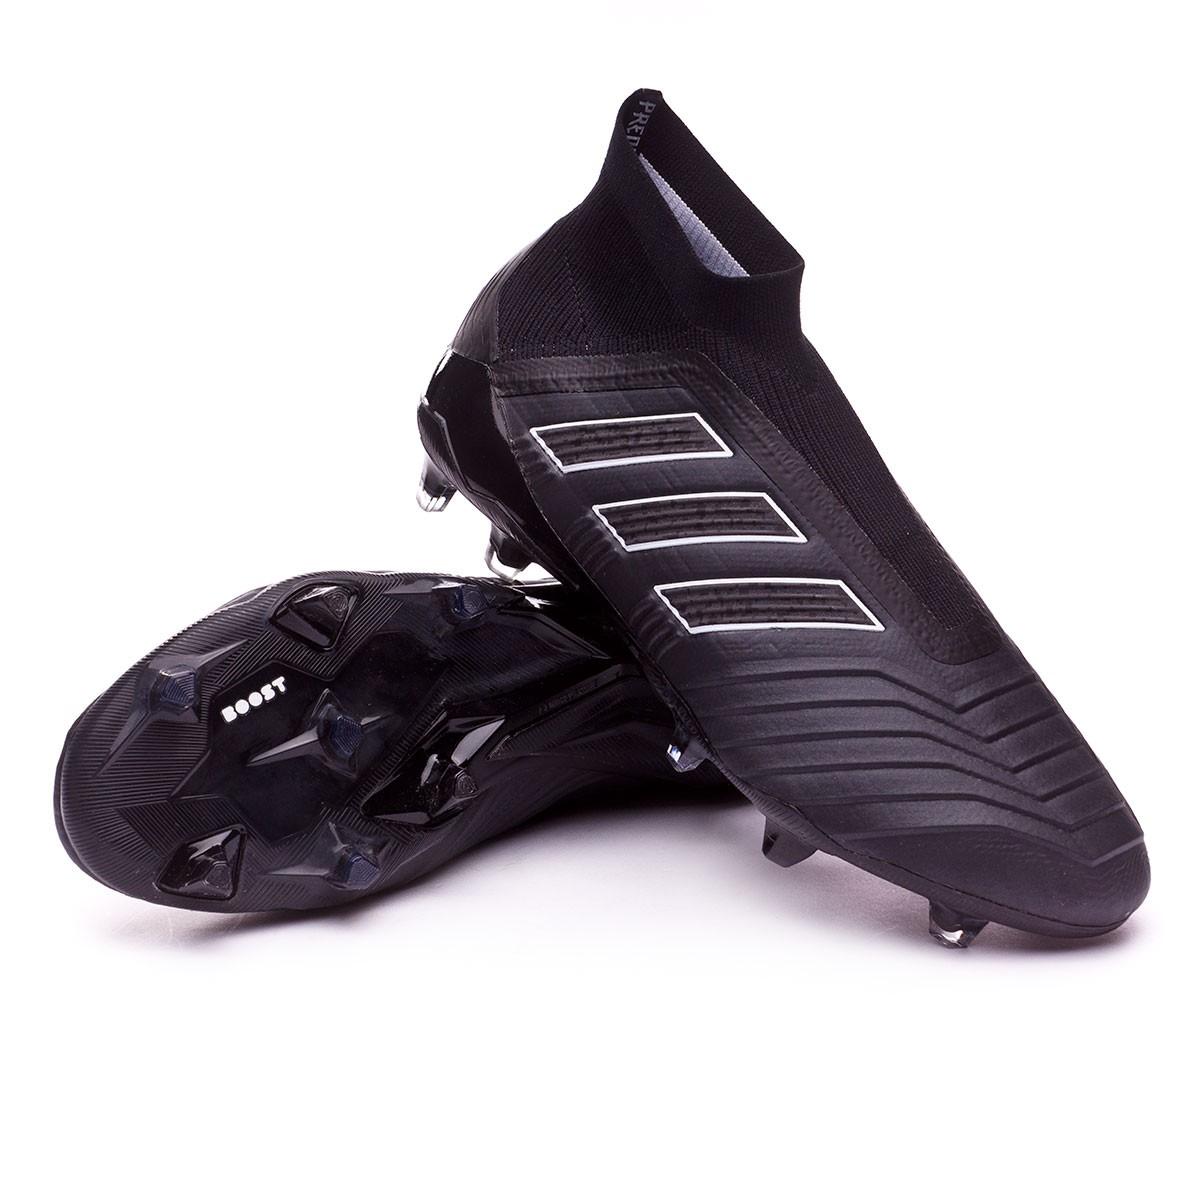 50013c79bf5f1 Chuteira adidas Predator 18+ FG Core black-White - Loja de futebol ...